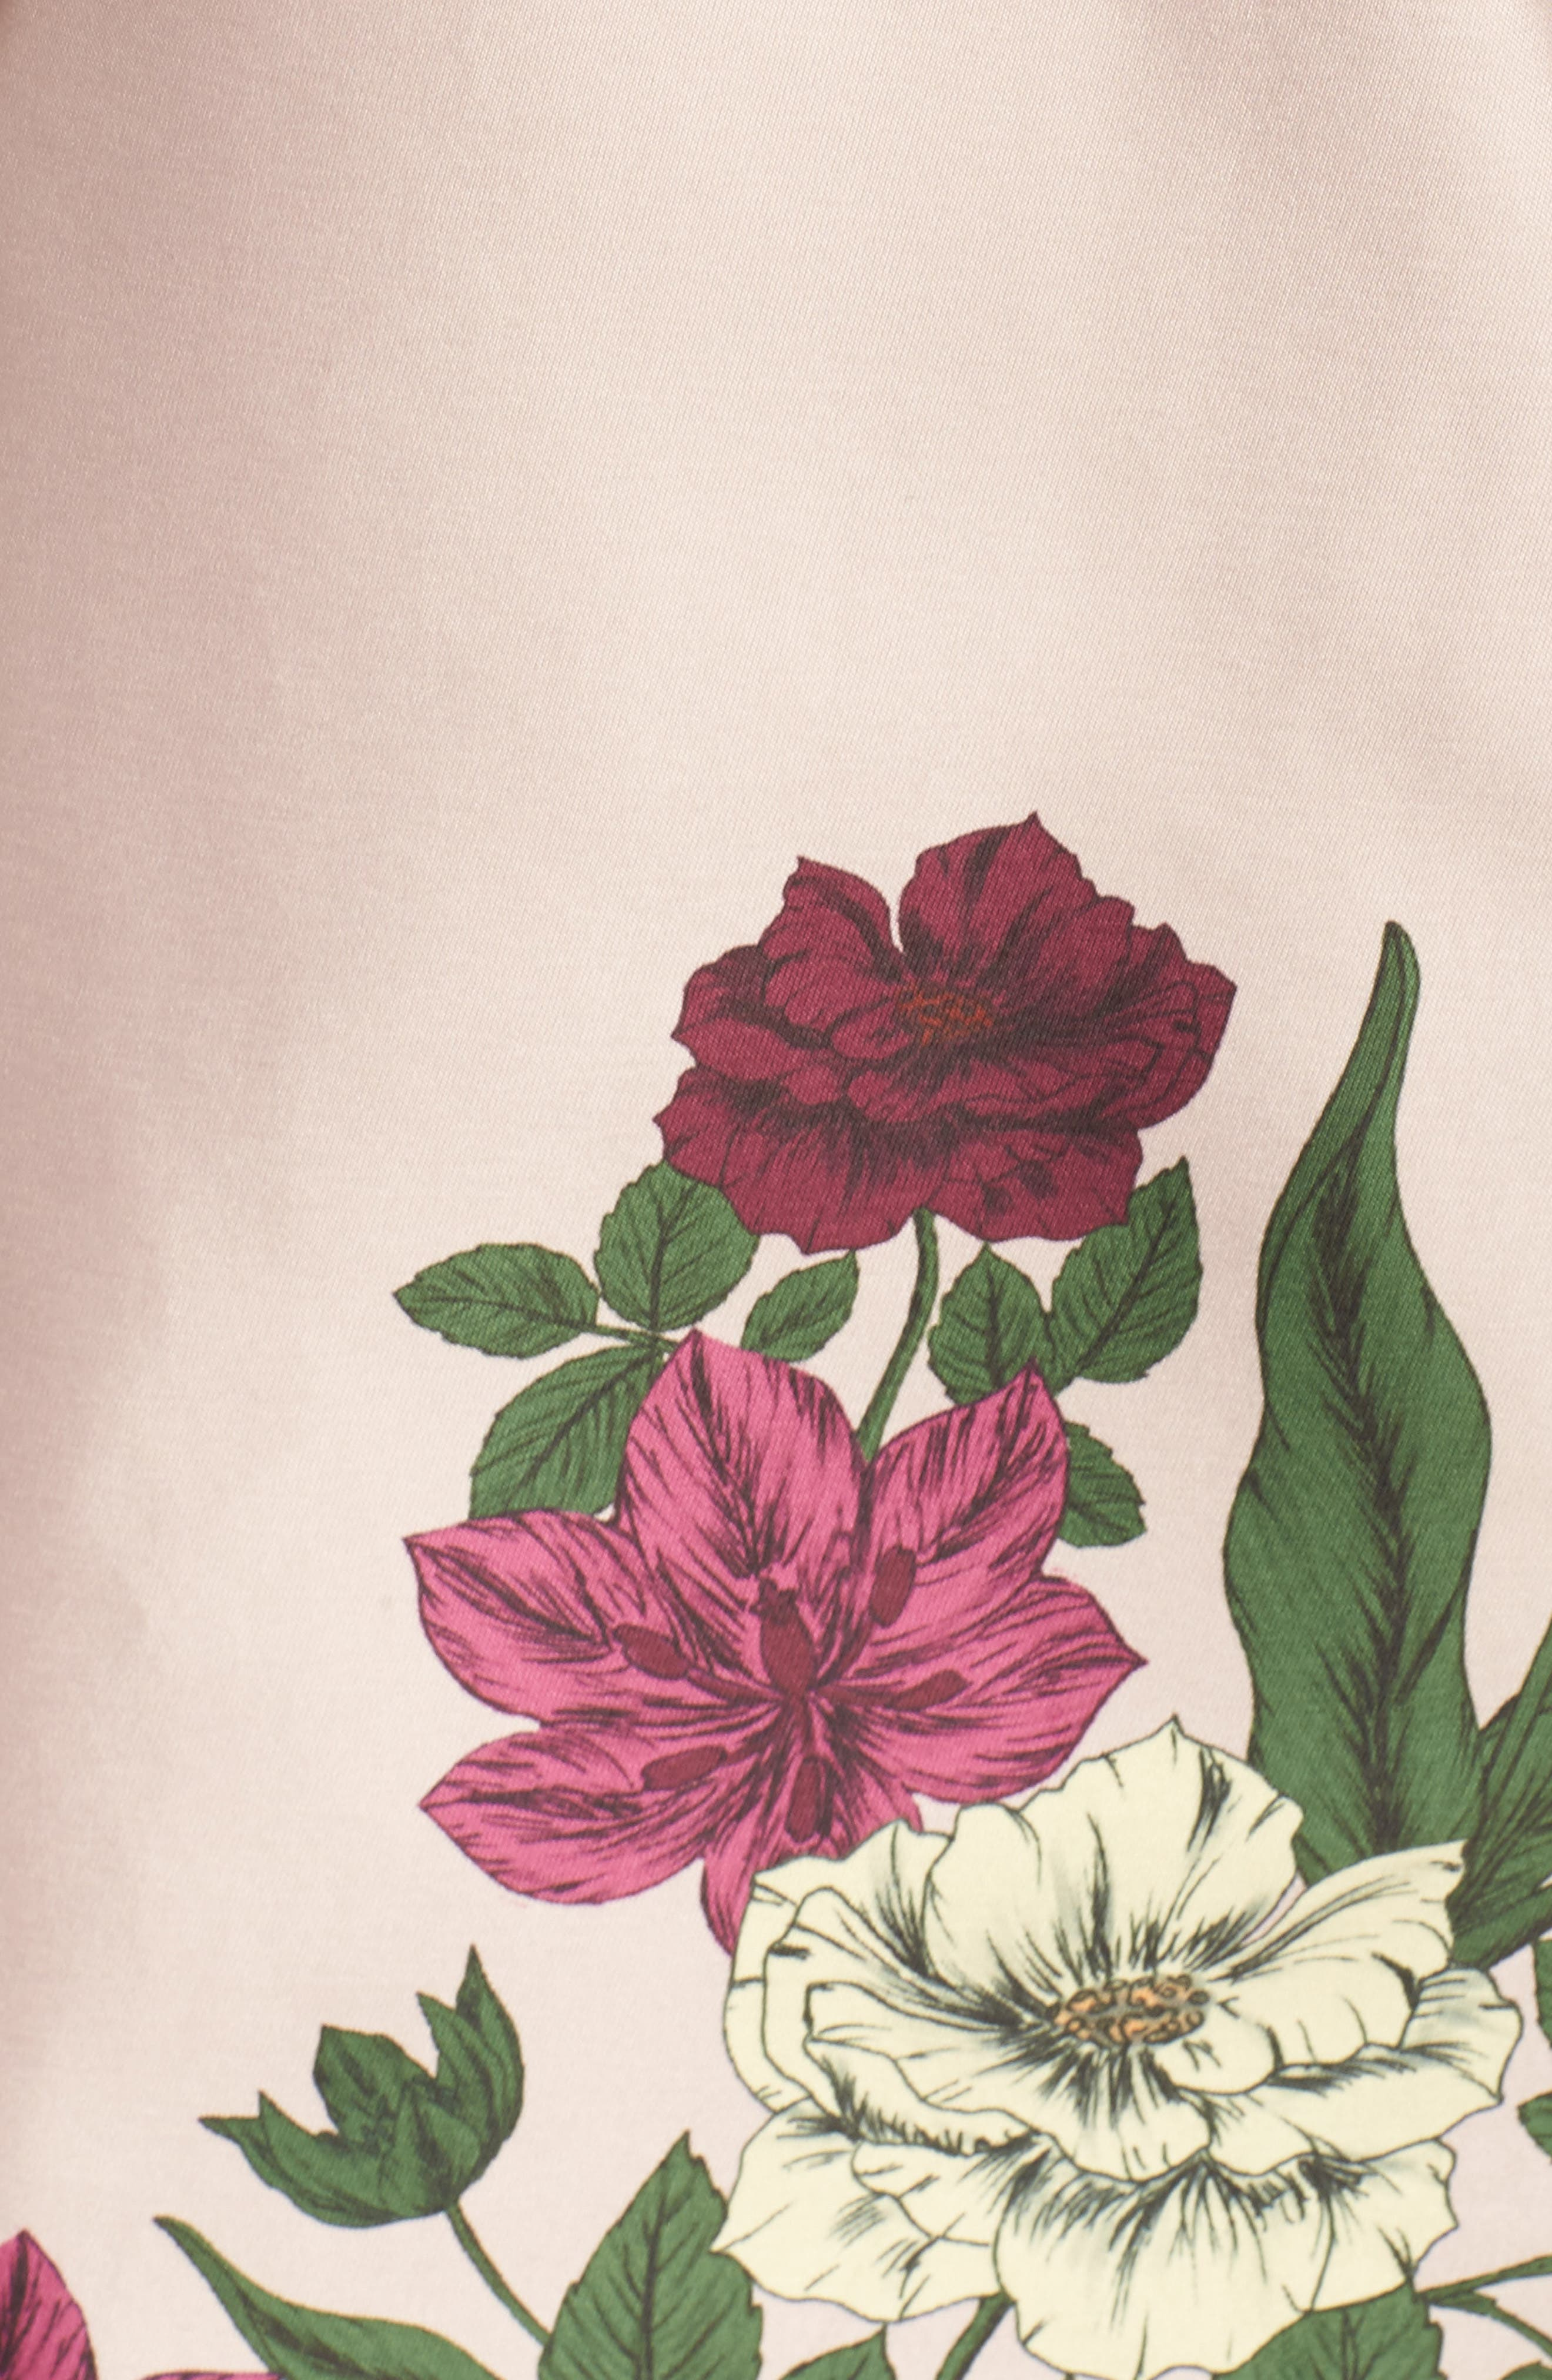 Night Lights Off the Shoulder Minidress,                             Alternate thumbnail 5, color,                             Blush Floral